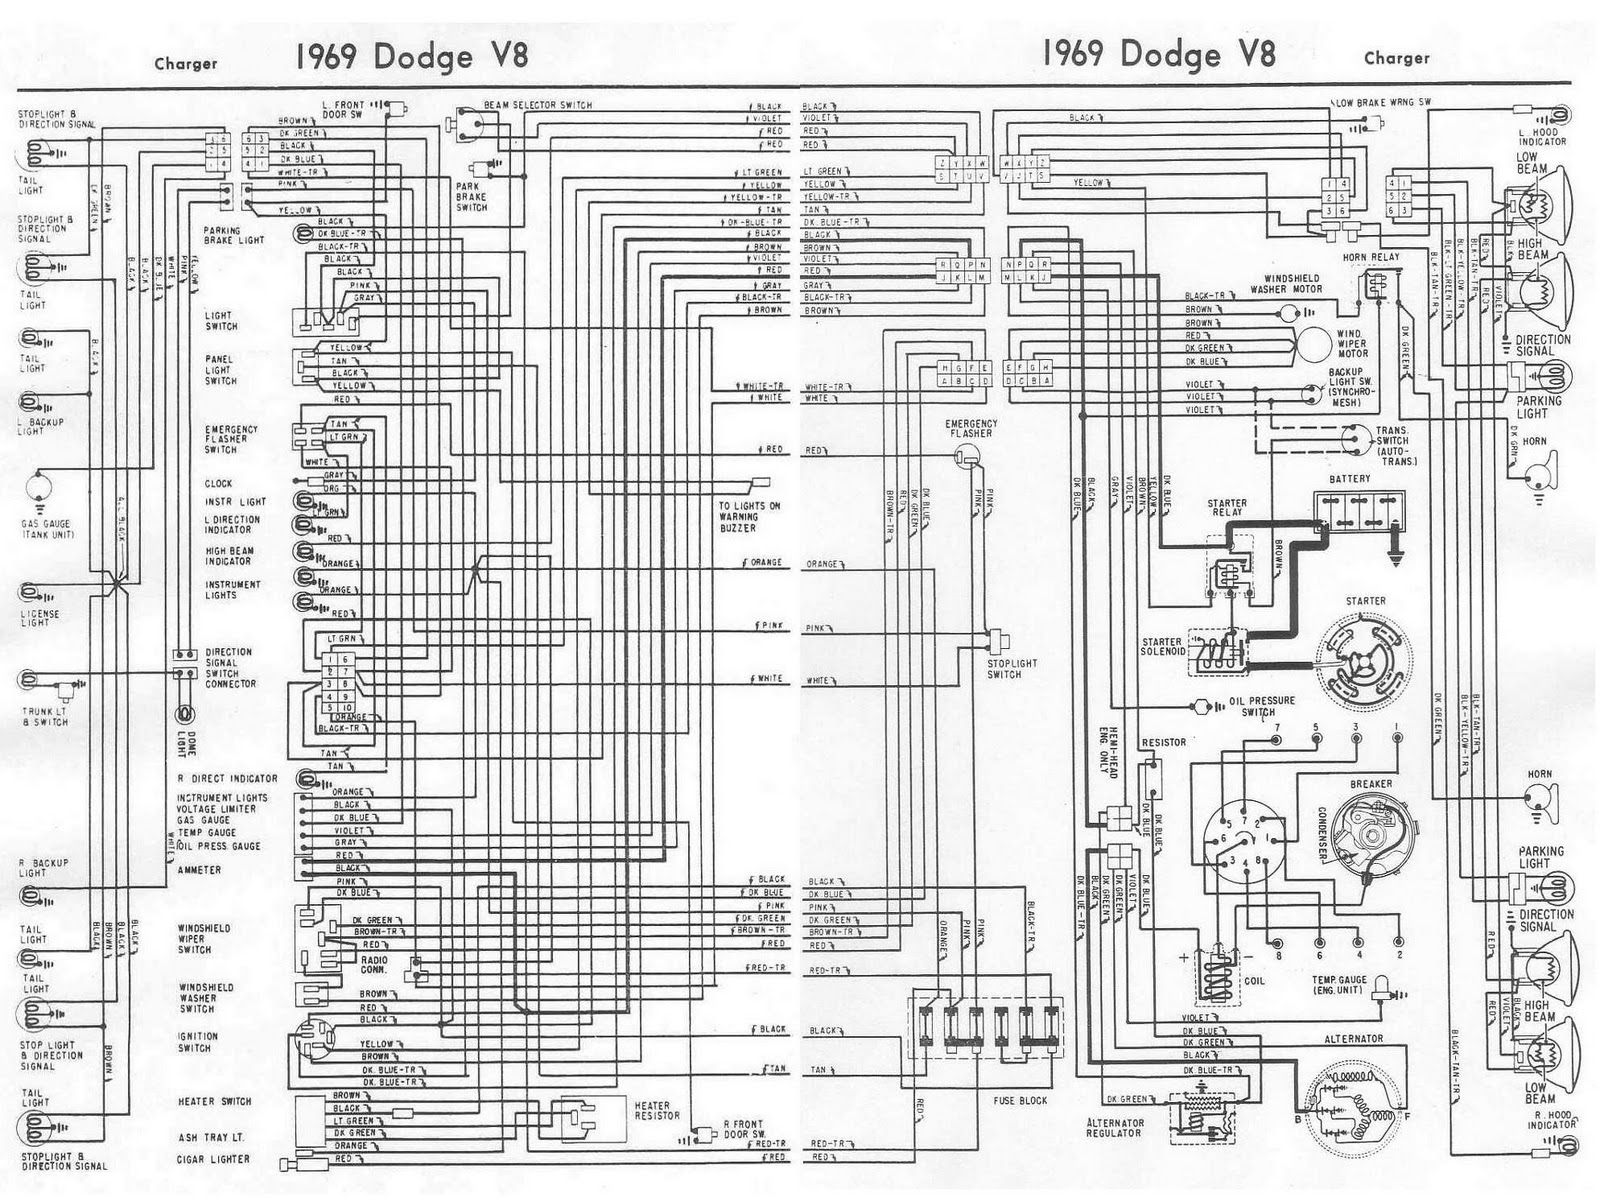 1969 mustang wiring diagram & amazon 1969 ford mustang 11 17 color 69 Mustang Wiring Diagram 1969 ford mustang wiring diagram 1969 mustang wiring diagram download 69 Mustang Fuse Box Diagram 1969 Ford Mustang Voltage Regulator Wiring Diagram